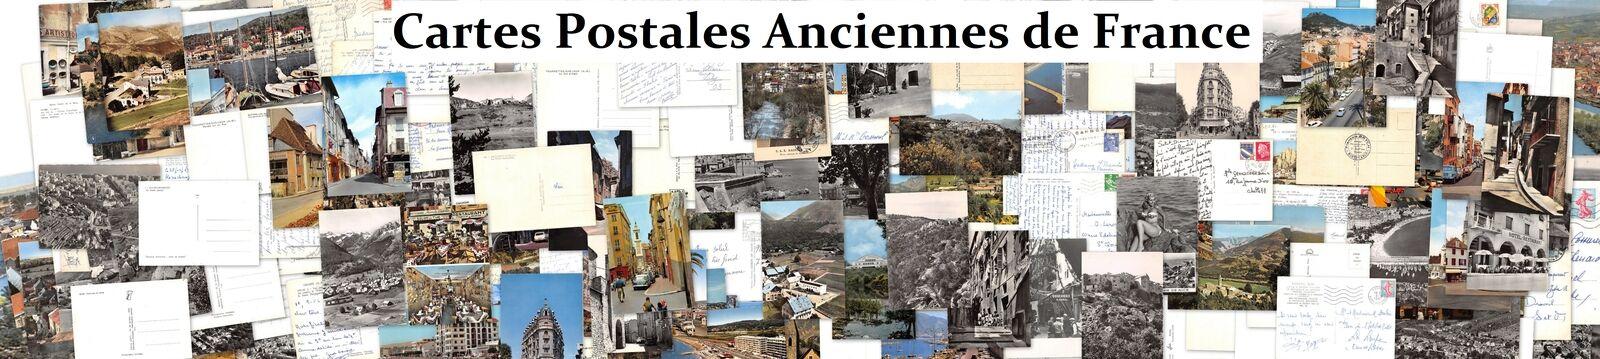 CARTES POSTALES ANCIENNES DE FRANCE